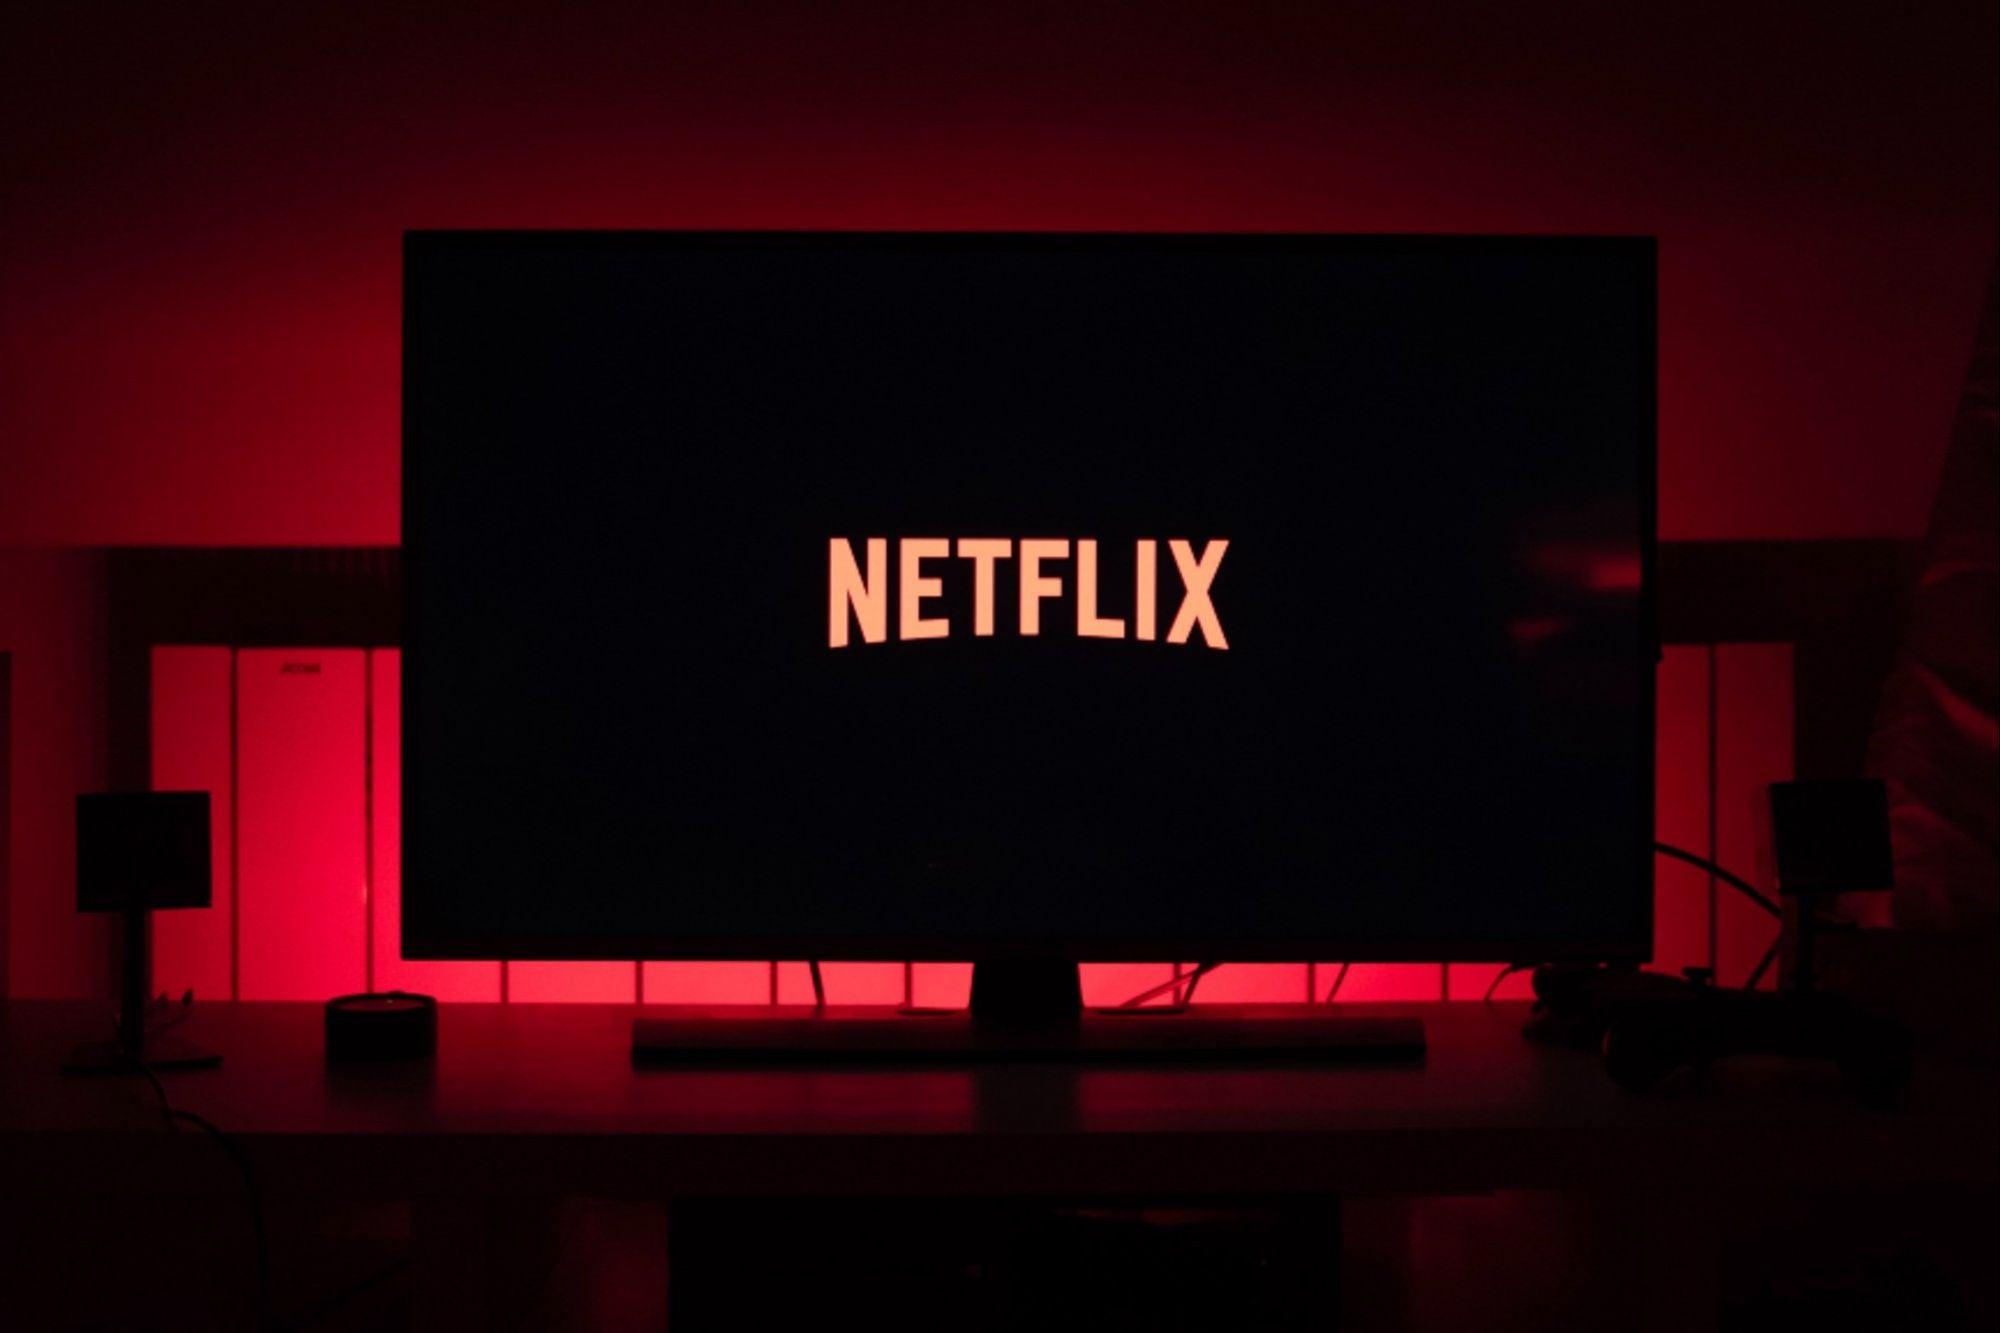 Con este hack podrás acceder al catálogo oculto de Netflix